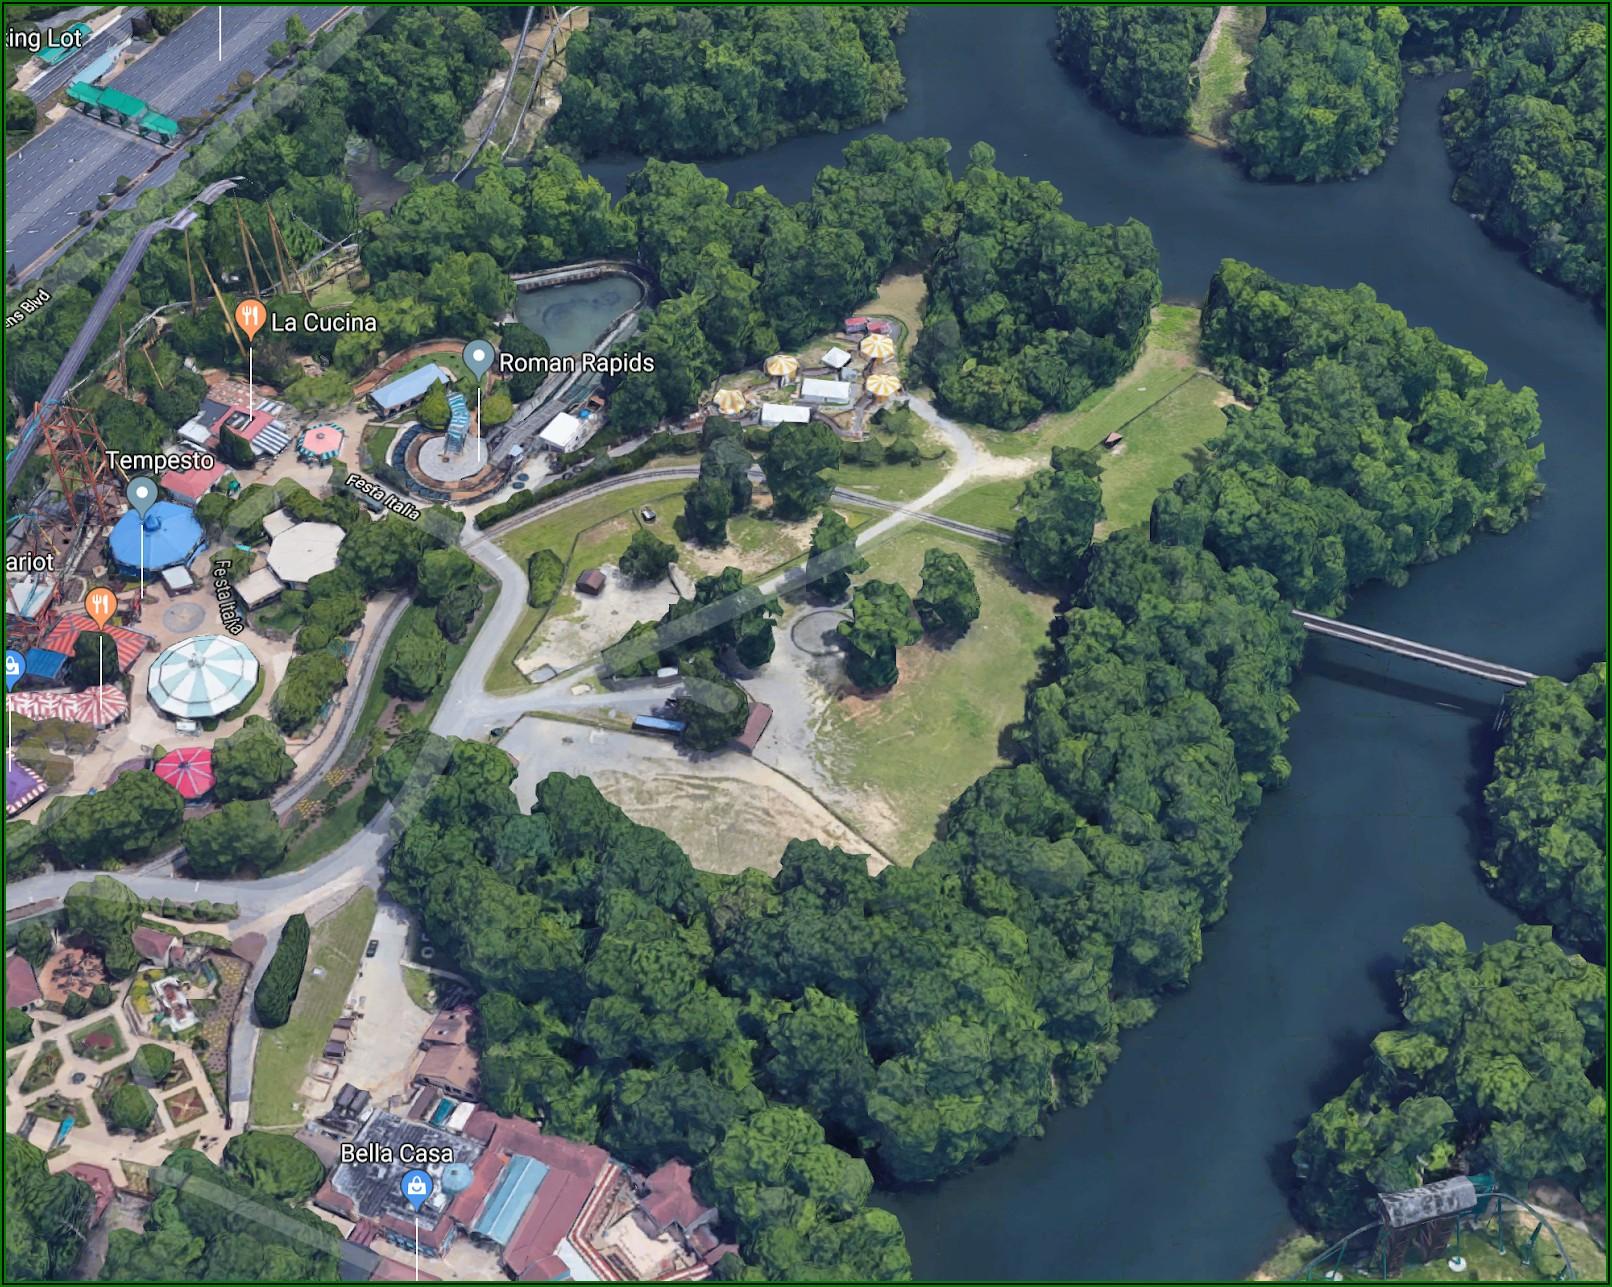 Busch Gardens Williamsburg Parking Lot Map